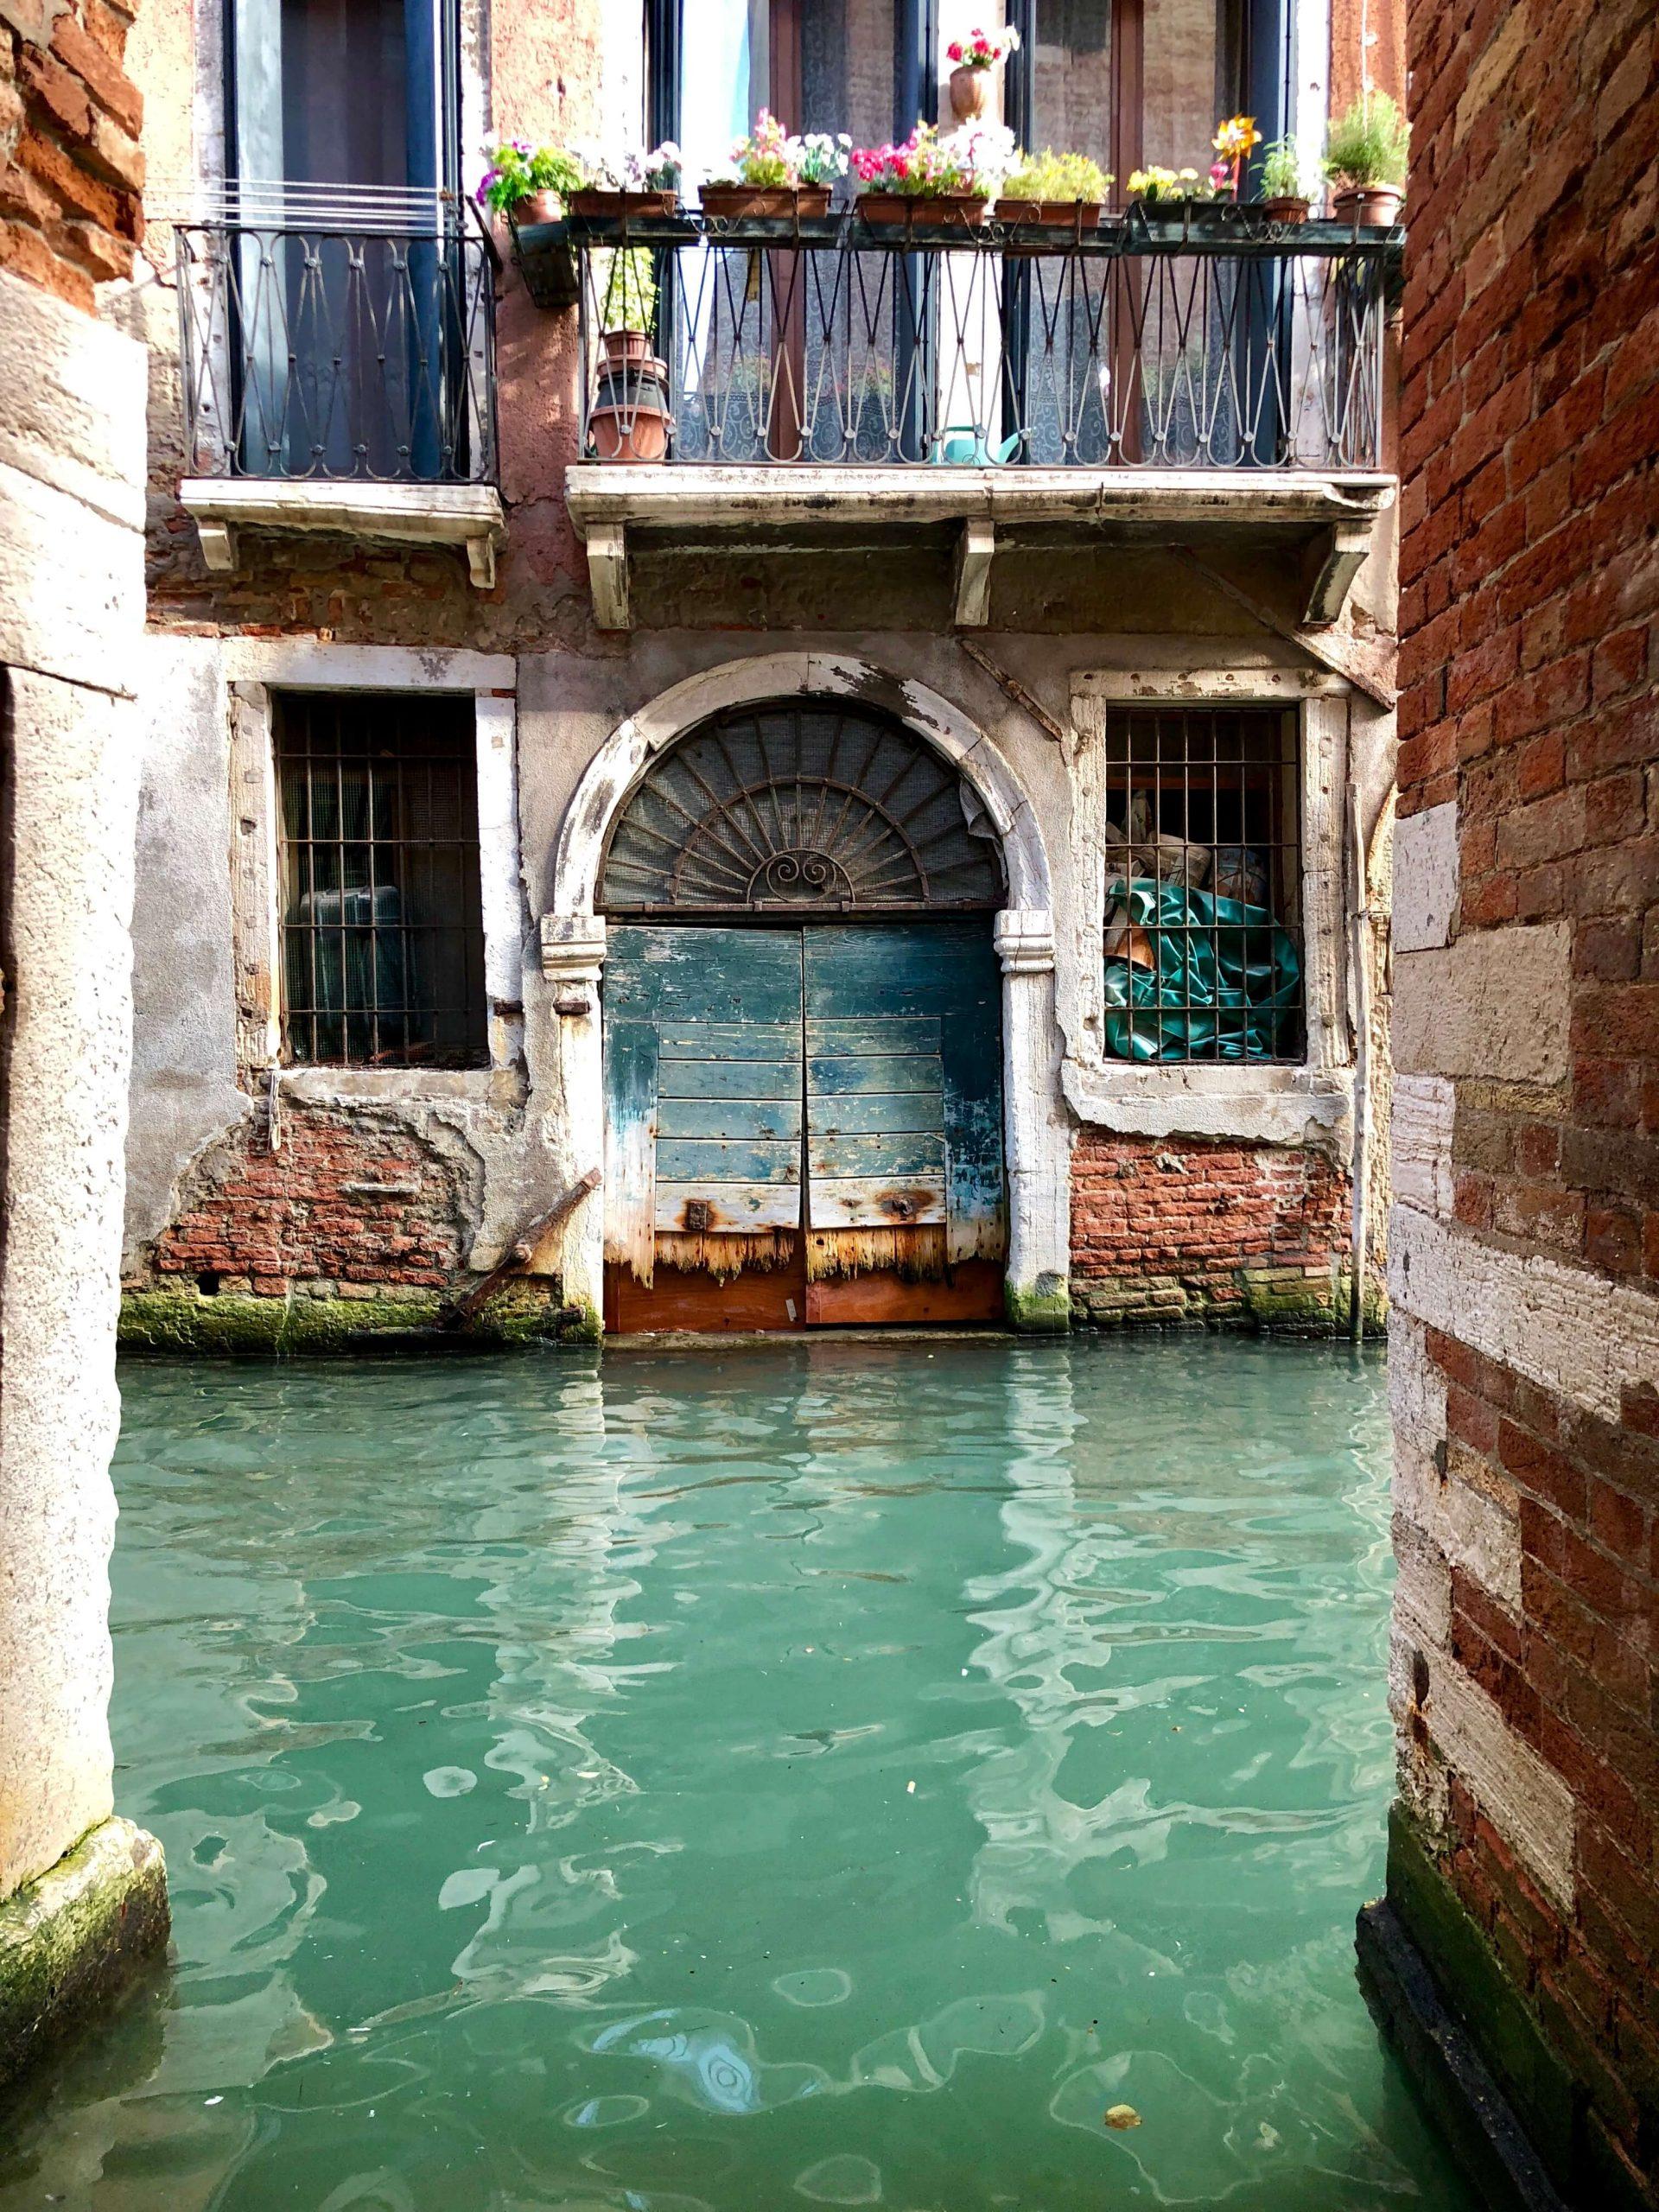 A Venetian garage